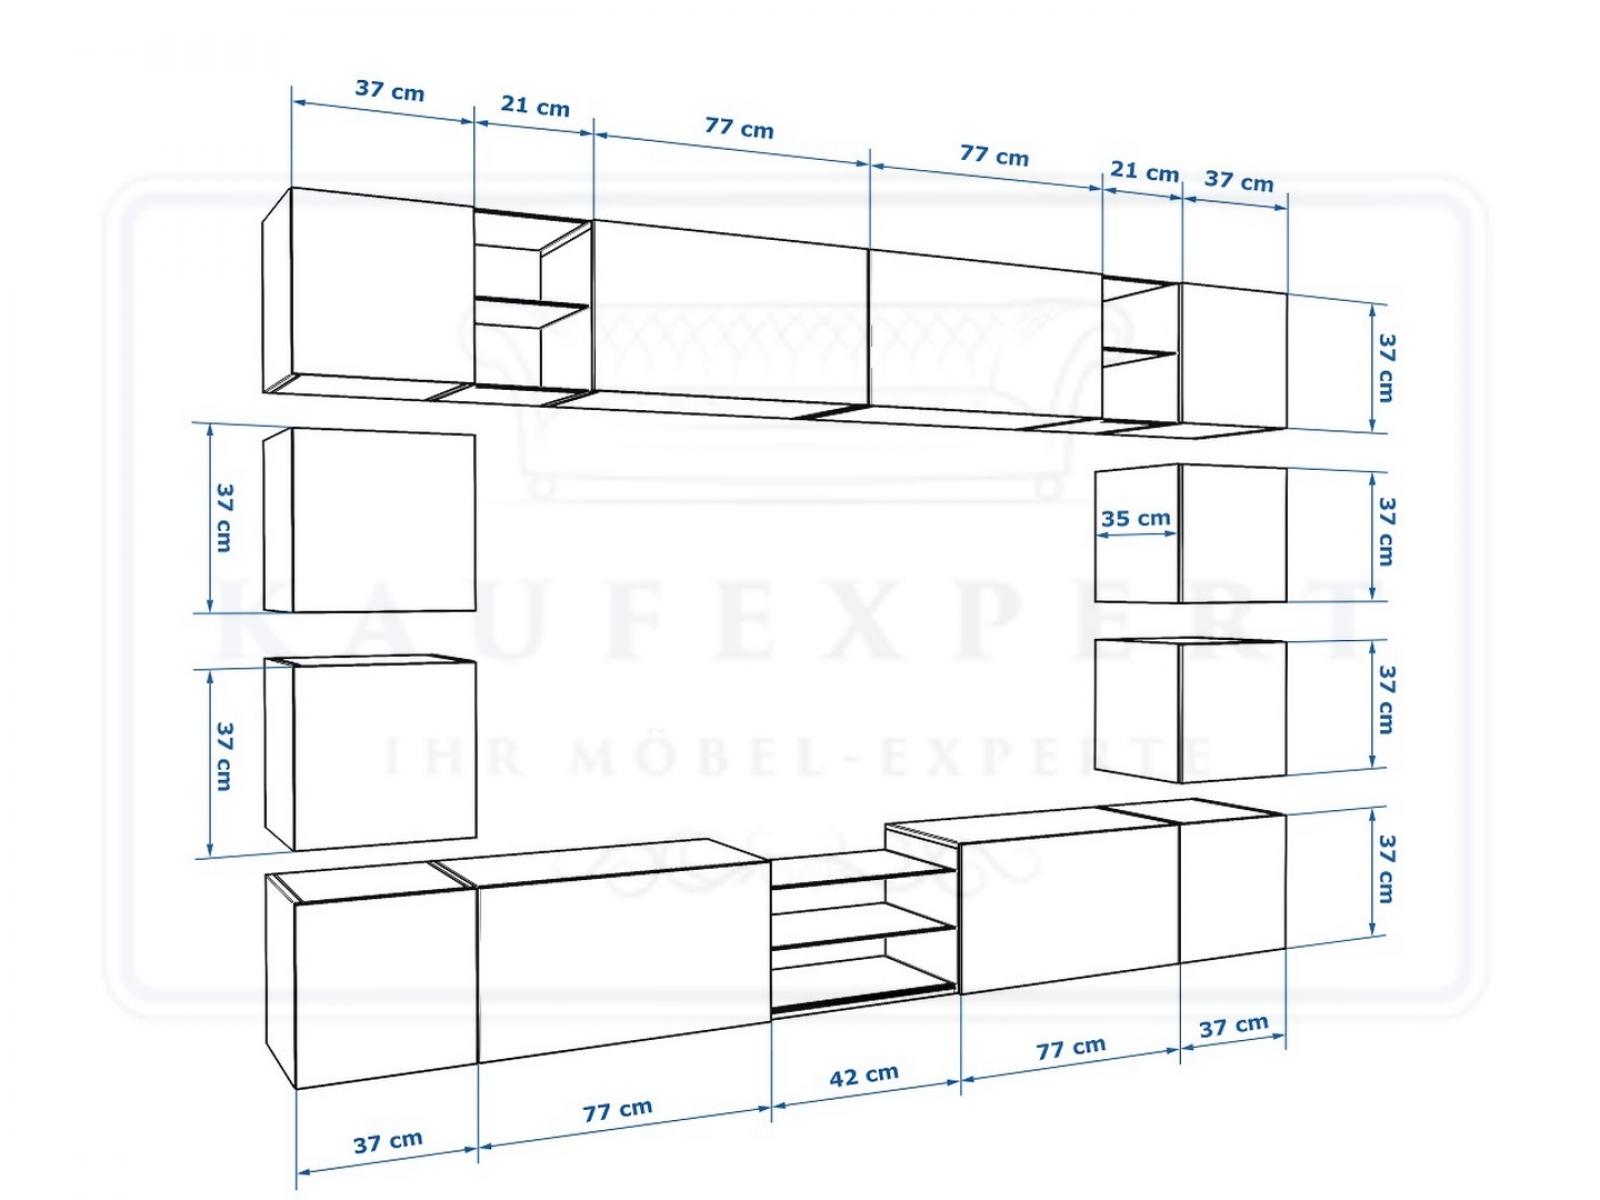 wohnwand edge schwarz hochglanz mediawand medienwand design modern led. Black Bedroom Furniture Sets. Home Design Ideas